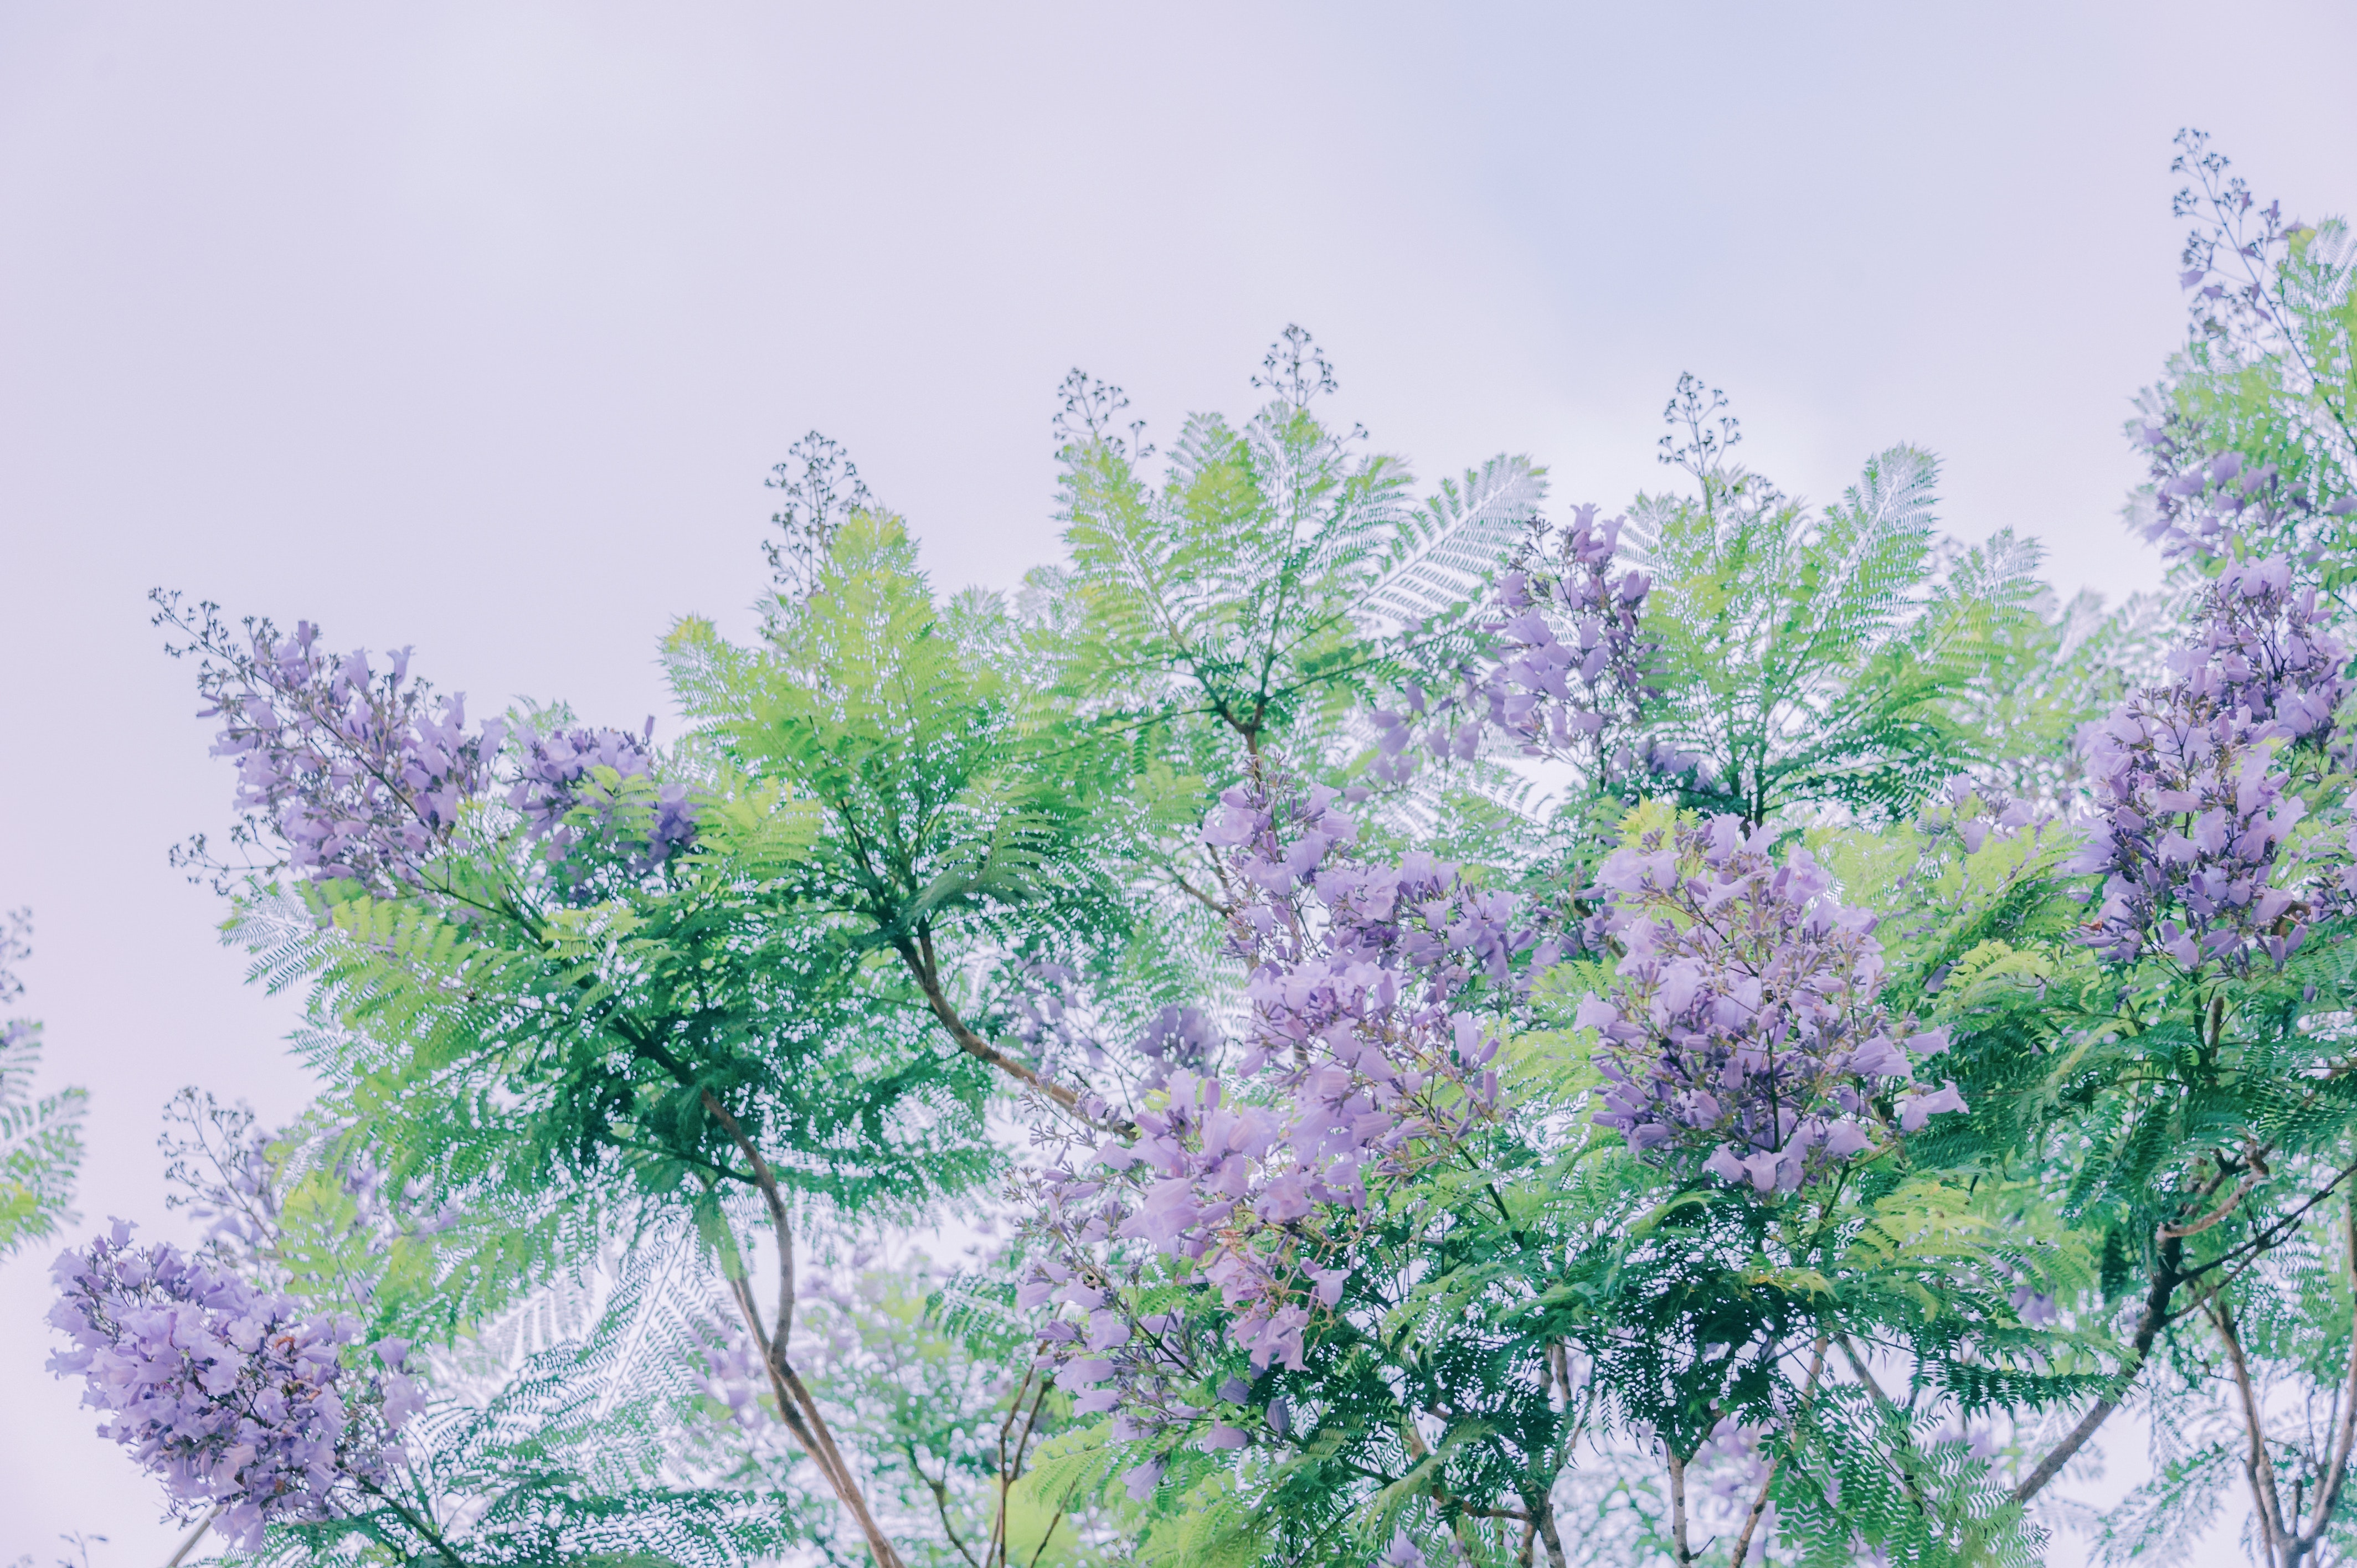 plant health care charlotte nc, crepe myrtle nc, crepe myrtle disease, crepe myrtle tree disease